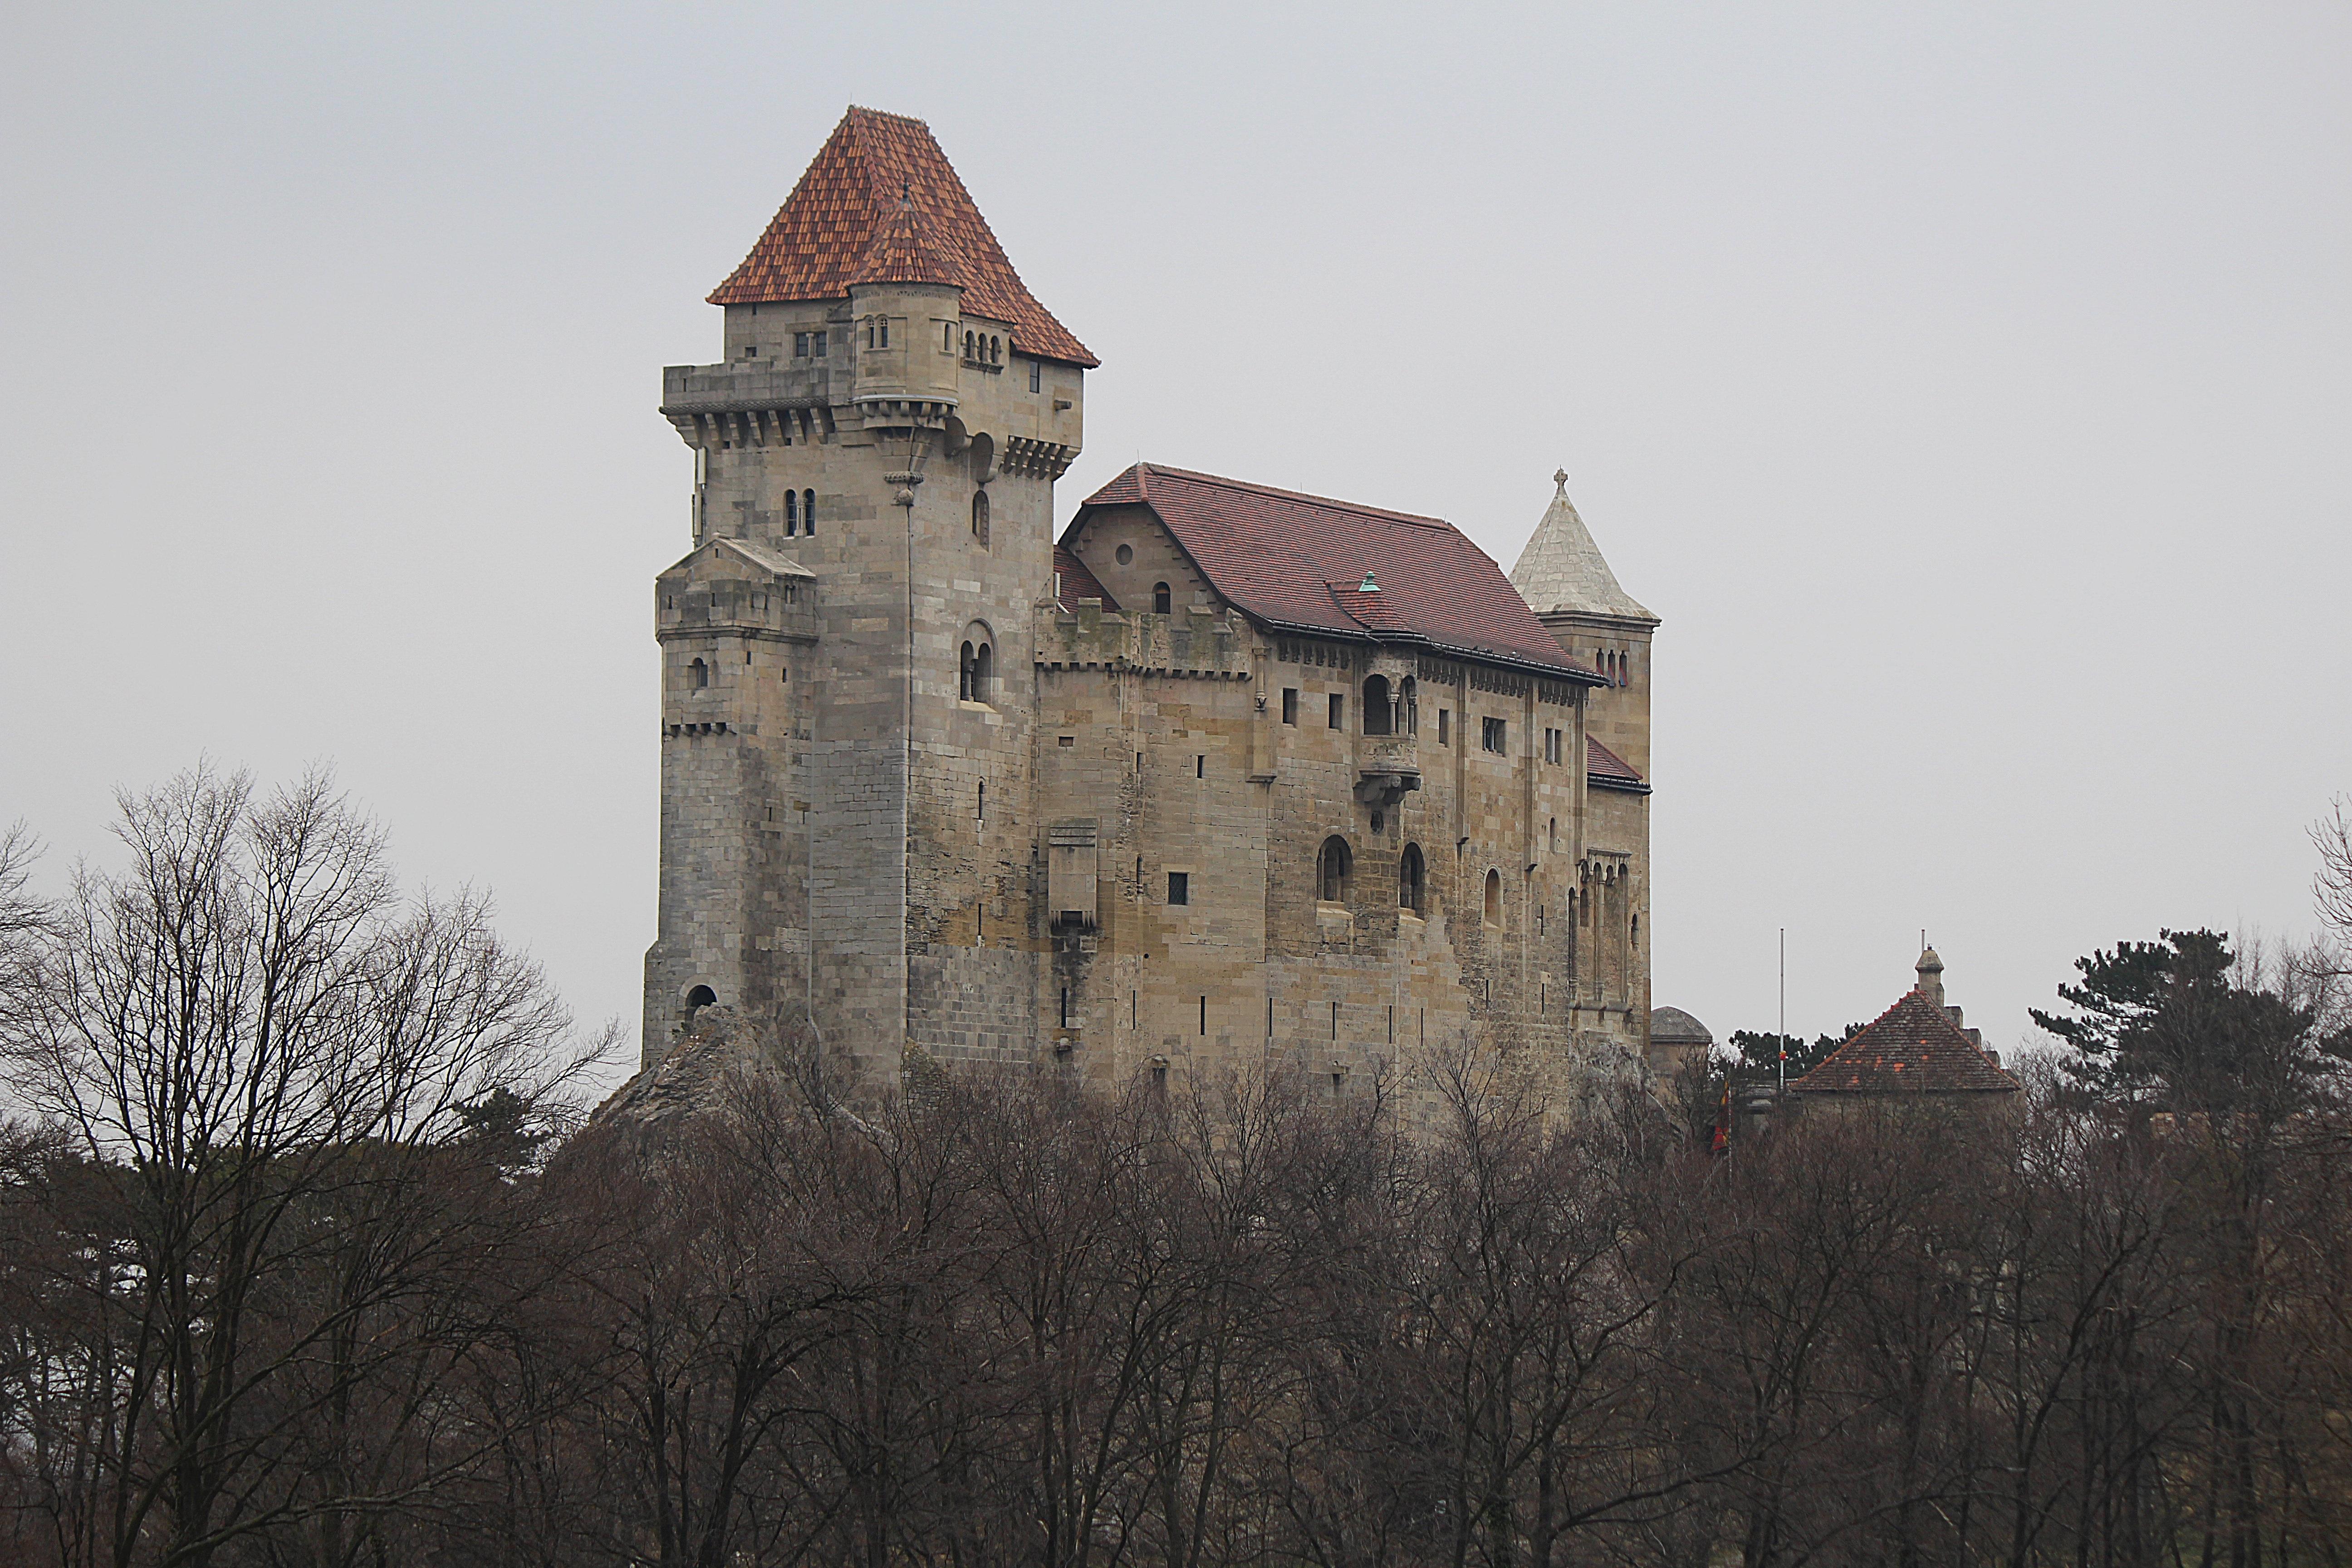 Burg Im Mittelalter Arbeitsblatt : Kostenlose foto gebäude chateau turm schloss